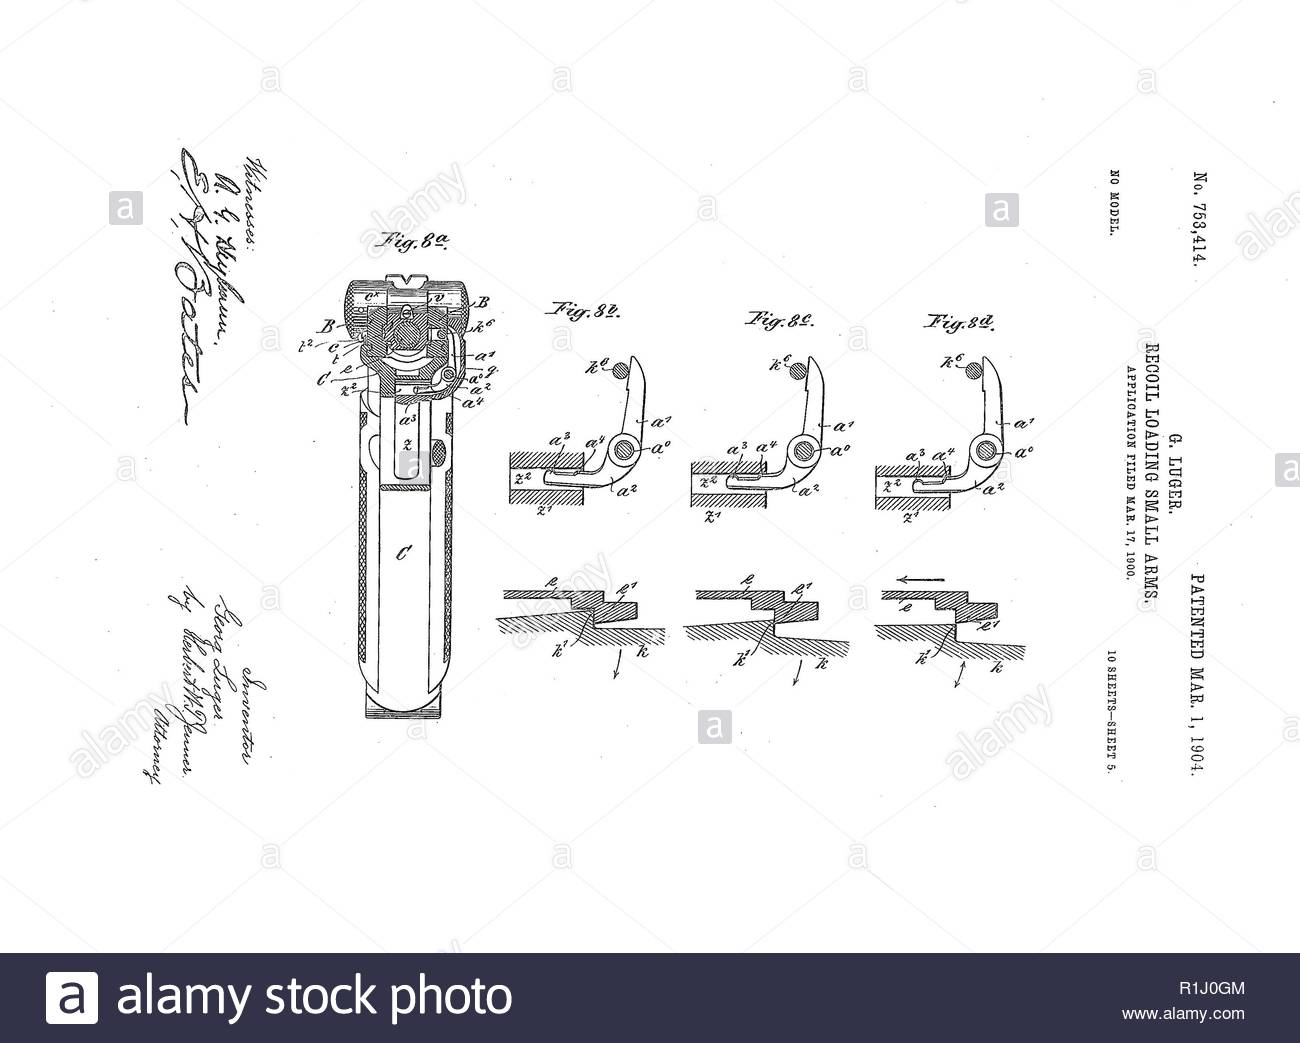 Luger - Parabellum pistol 10/7 - Stock Image